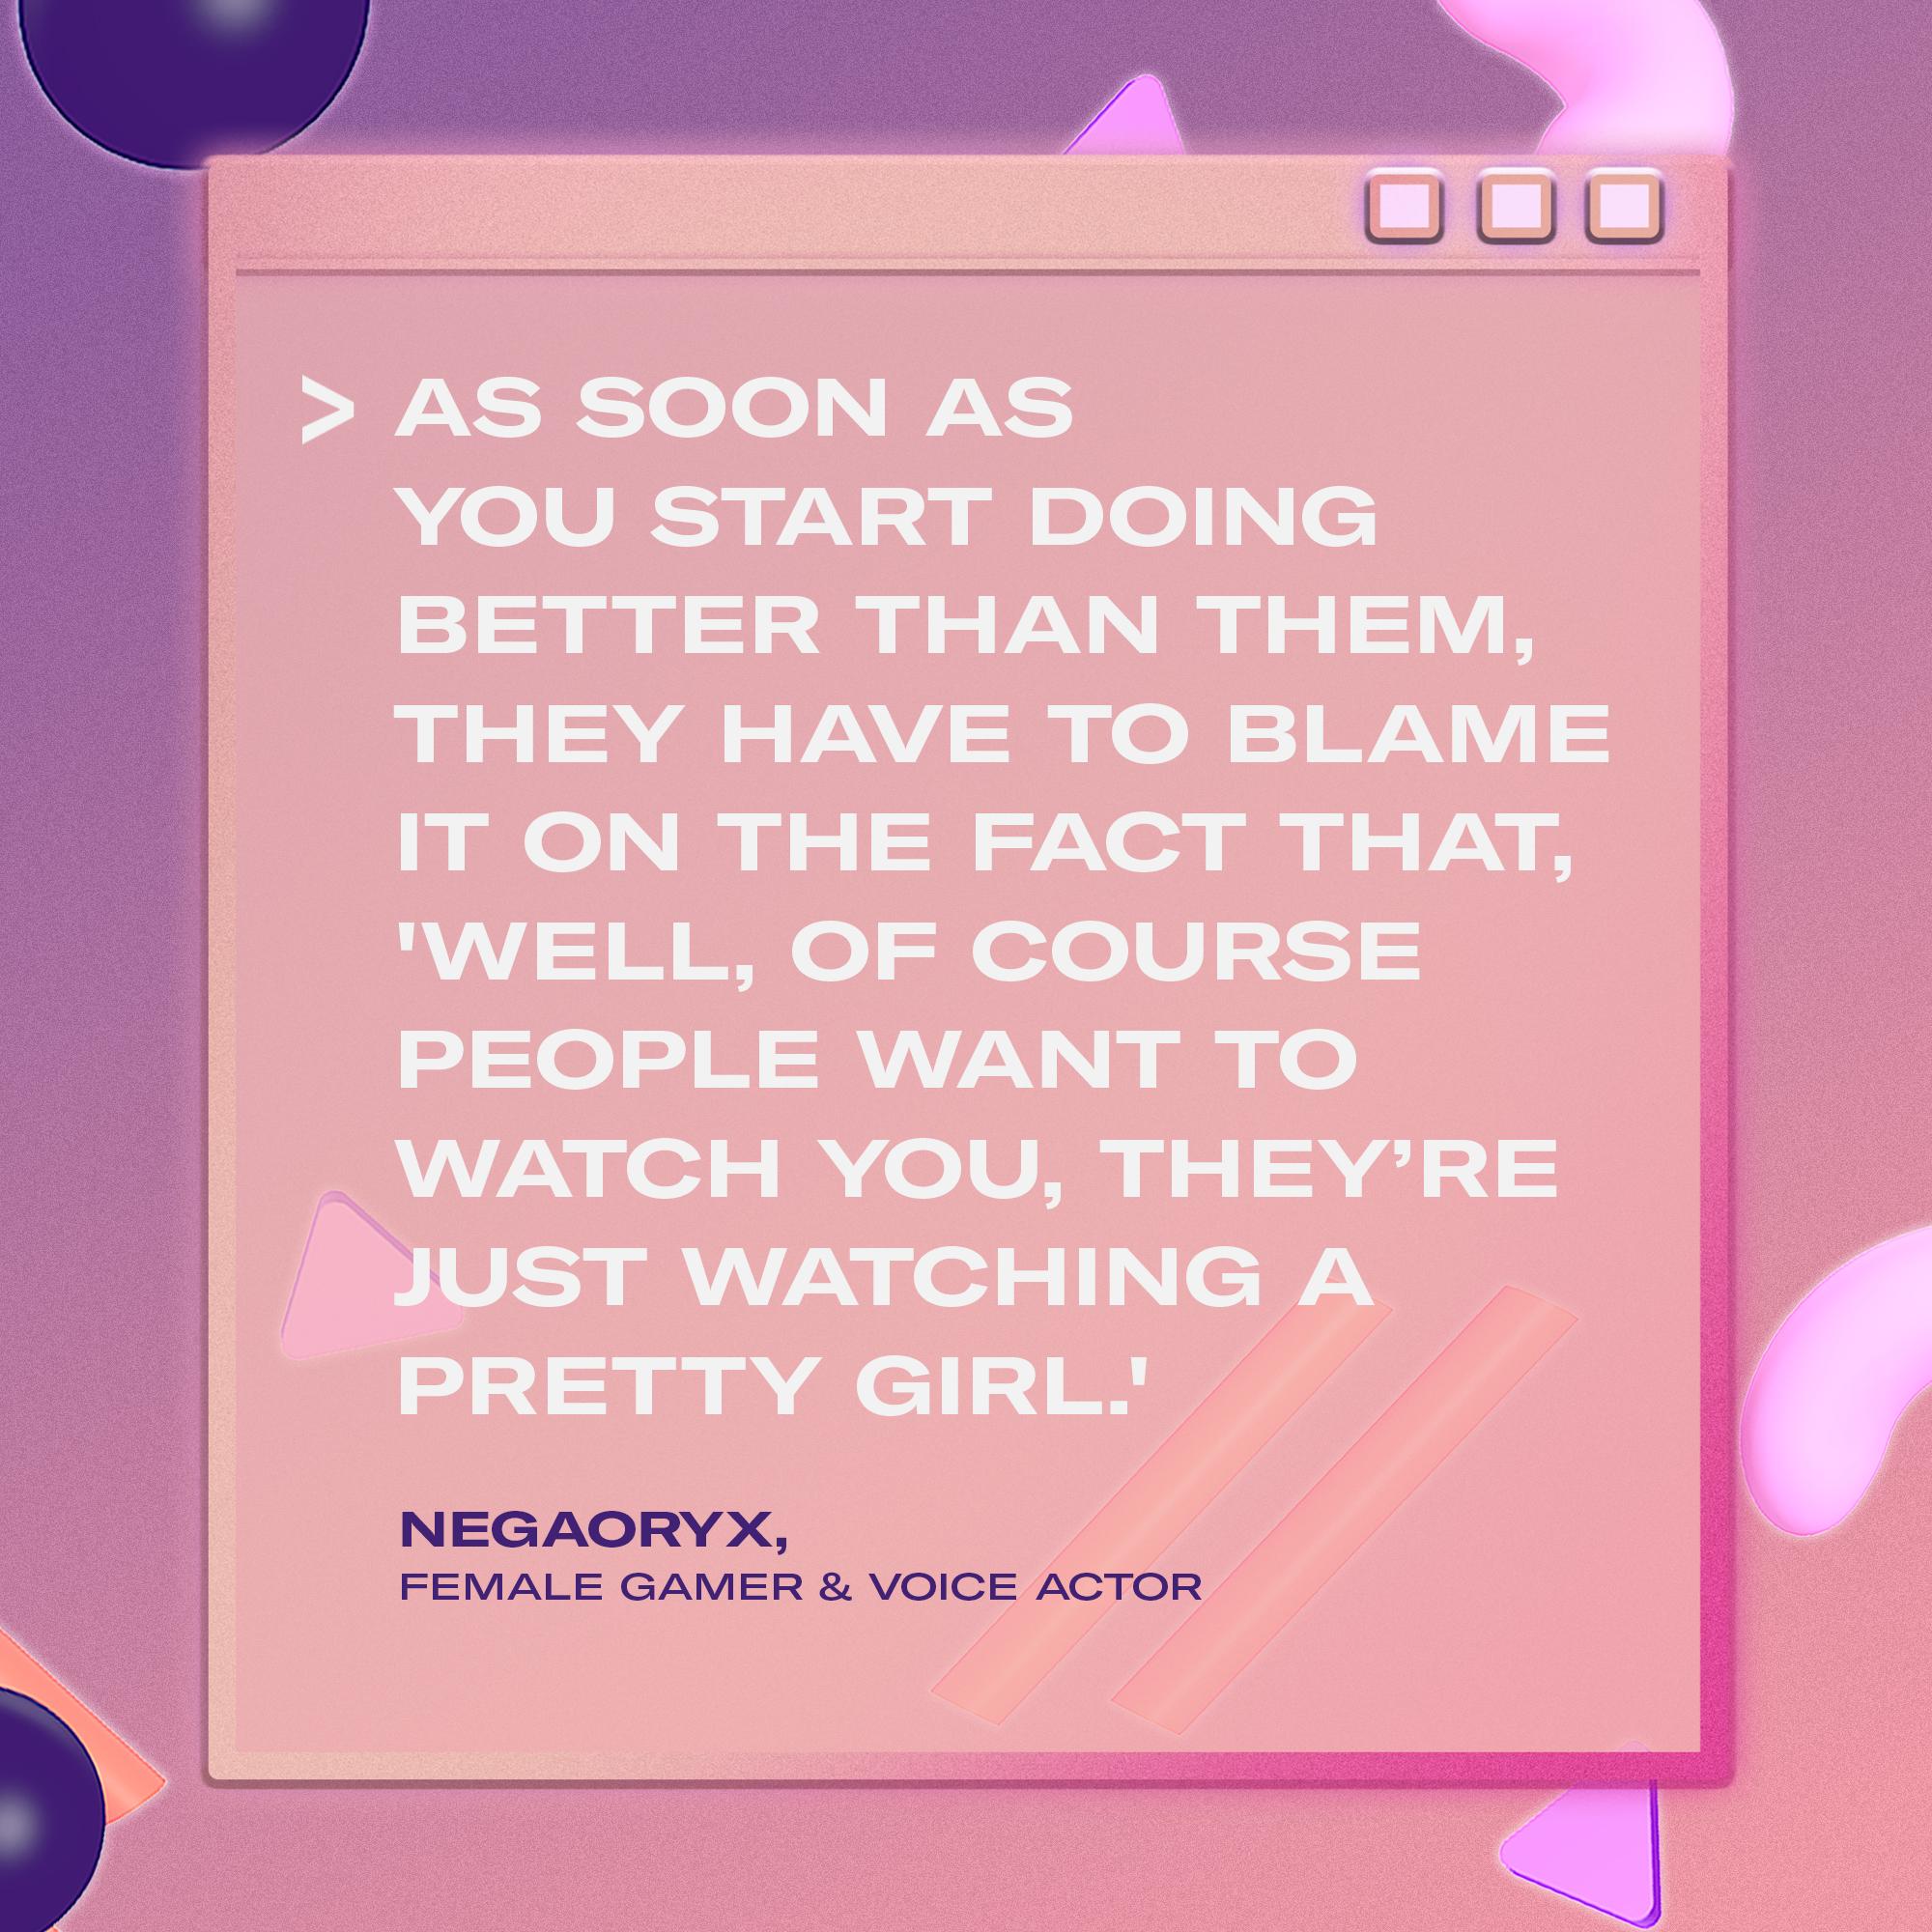 QuoteCard_Negaoryx